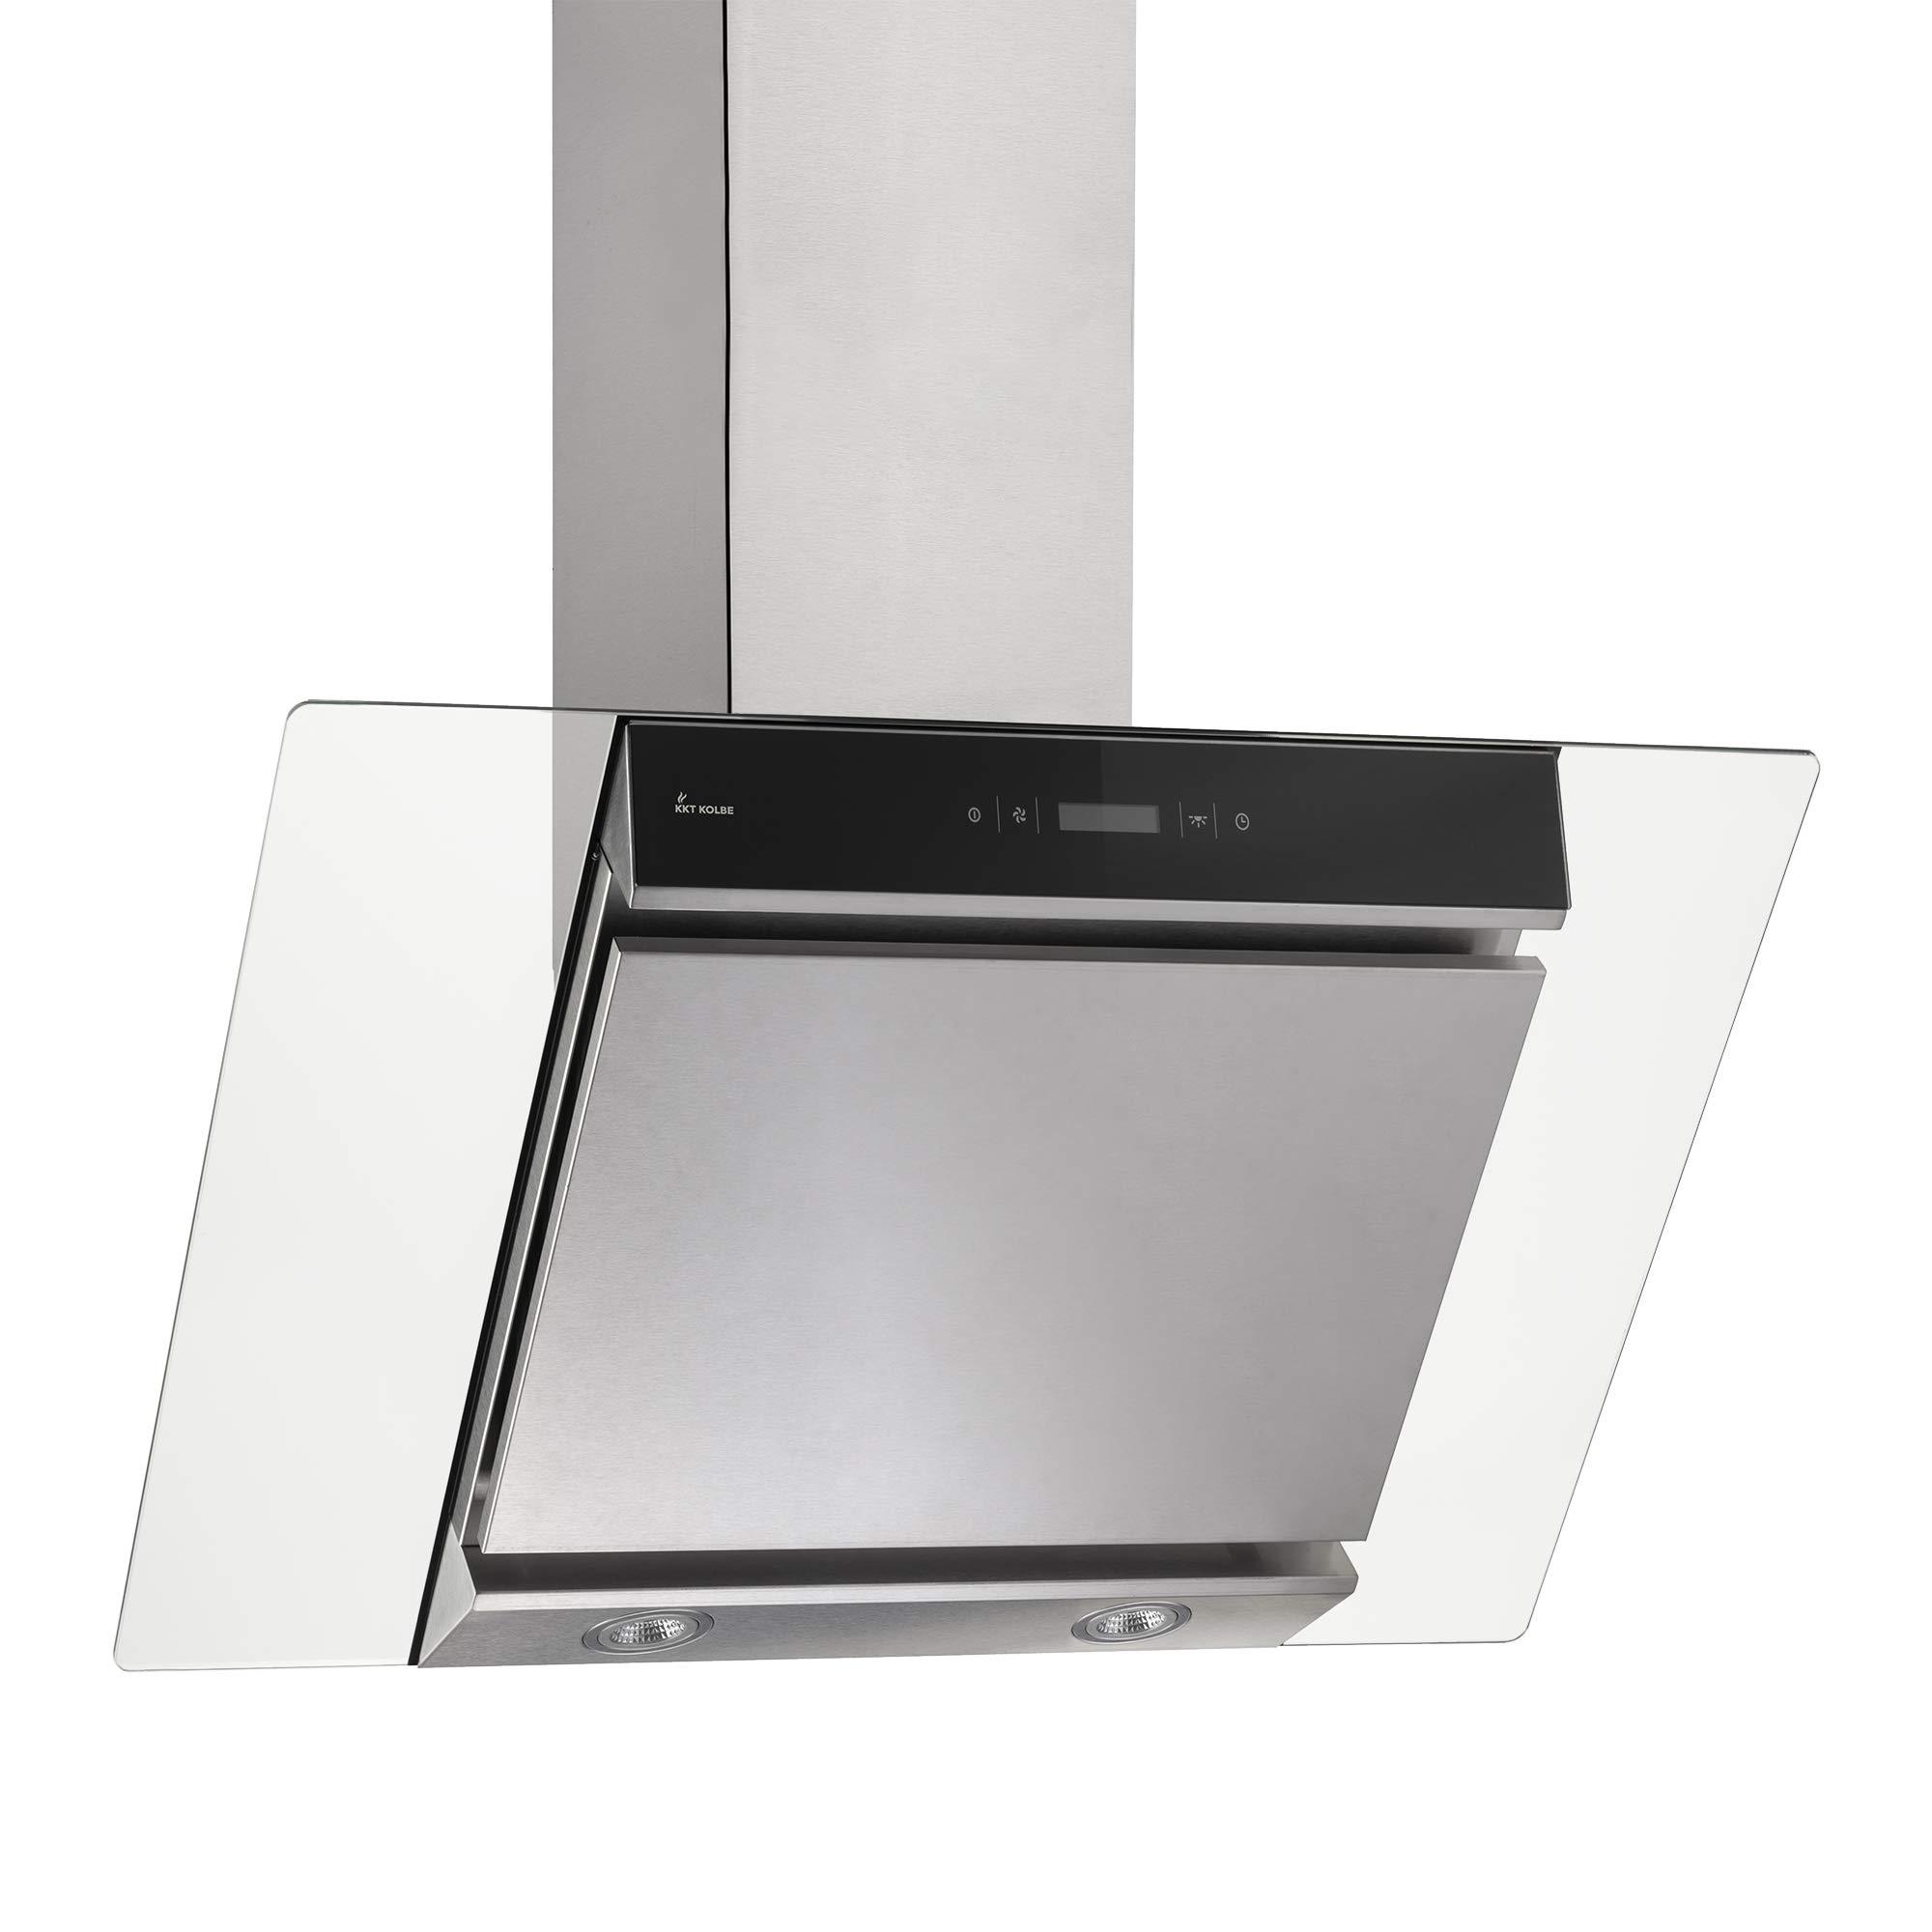 Campana extractora de pared (80 cm, acero inoxidable, cristal, extra silenciosa, 605m³/h, 4 escalones, iluminación LED, teclas de sensor TouchSelect) FREE8004TC - KKT KOLBE: Amazon.es: Hogar